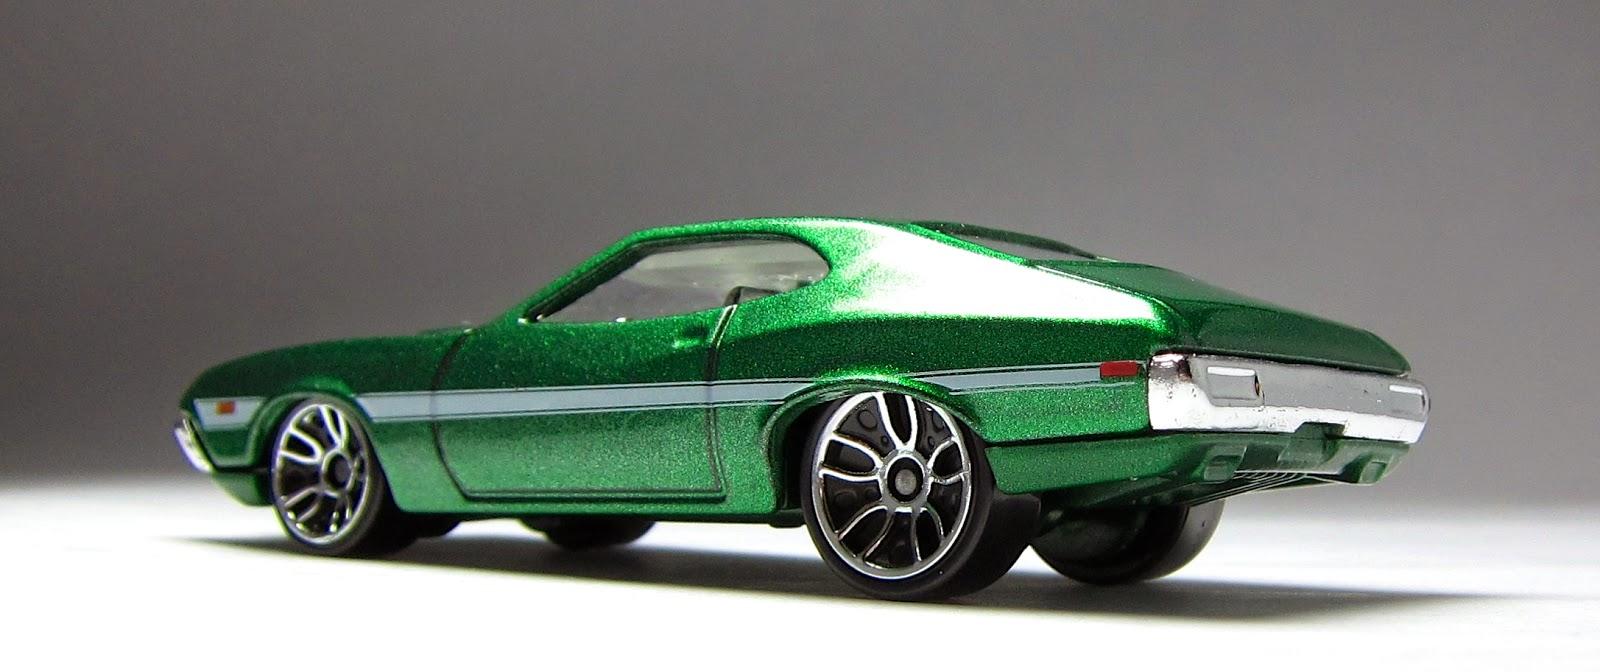 Hot wheels 72 ford gran torino sport 2014 fast furious exclusive